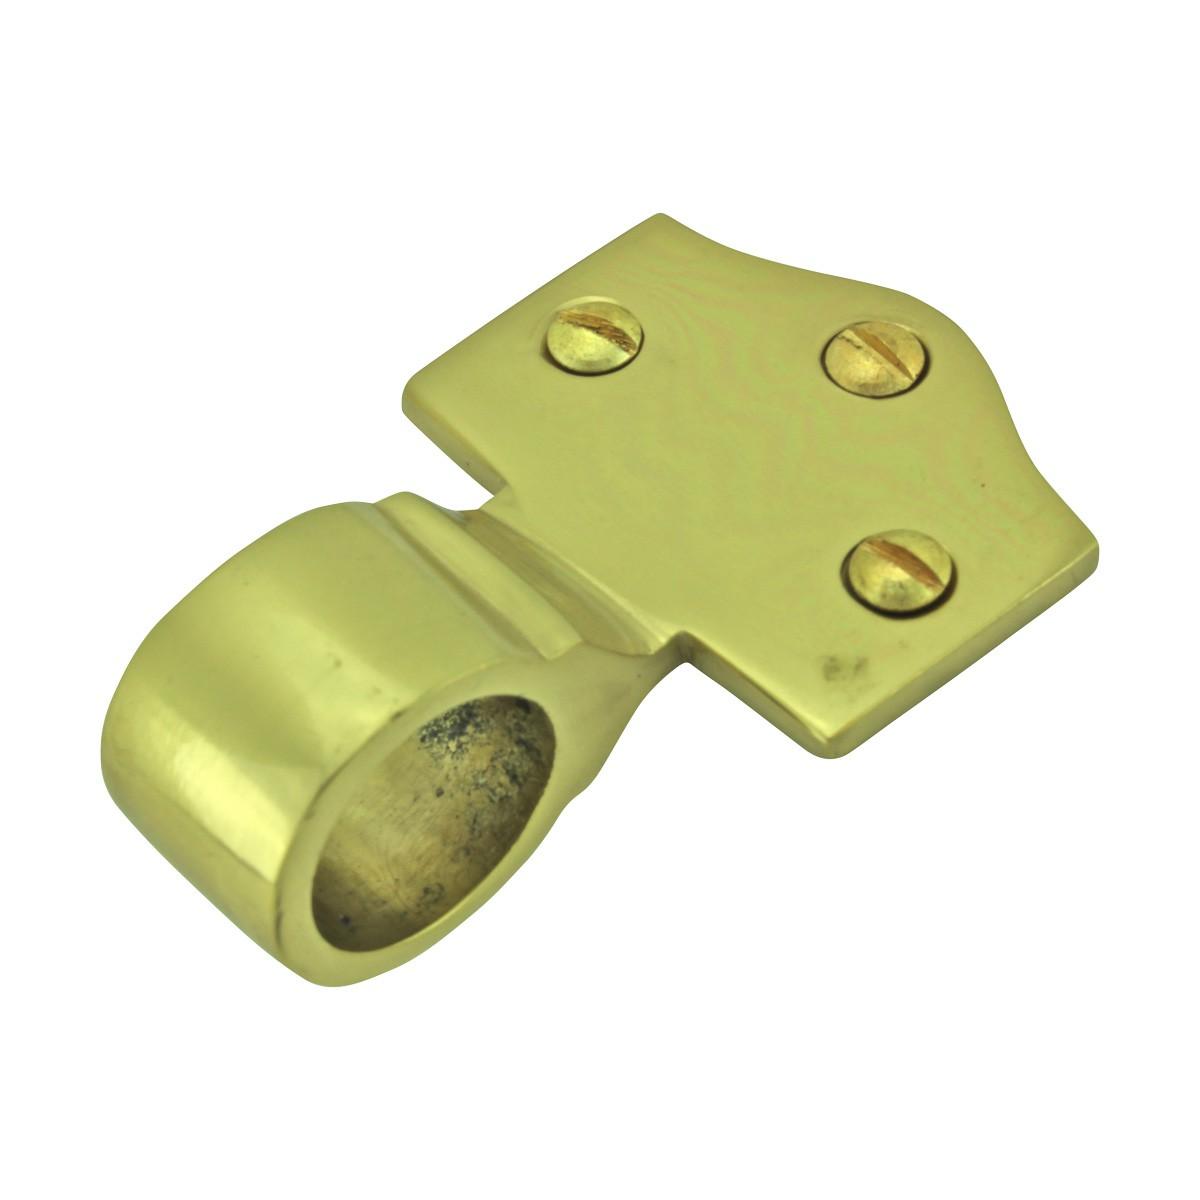 10 Sash Lift Solid Brass Offset Eye Window Pulls Window Lifts Sash Lift